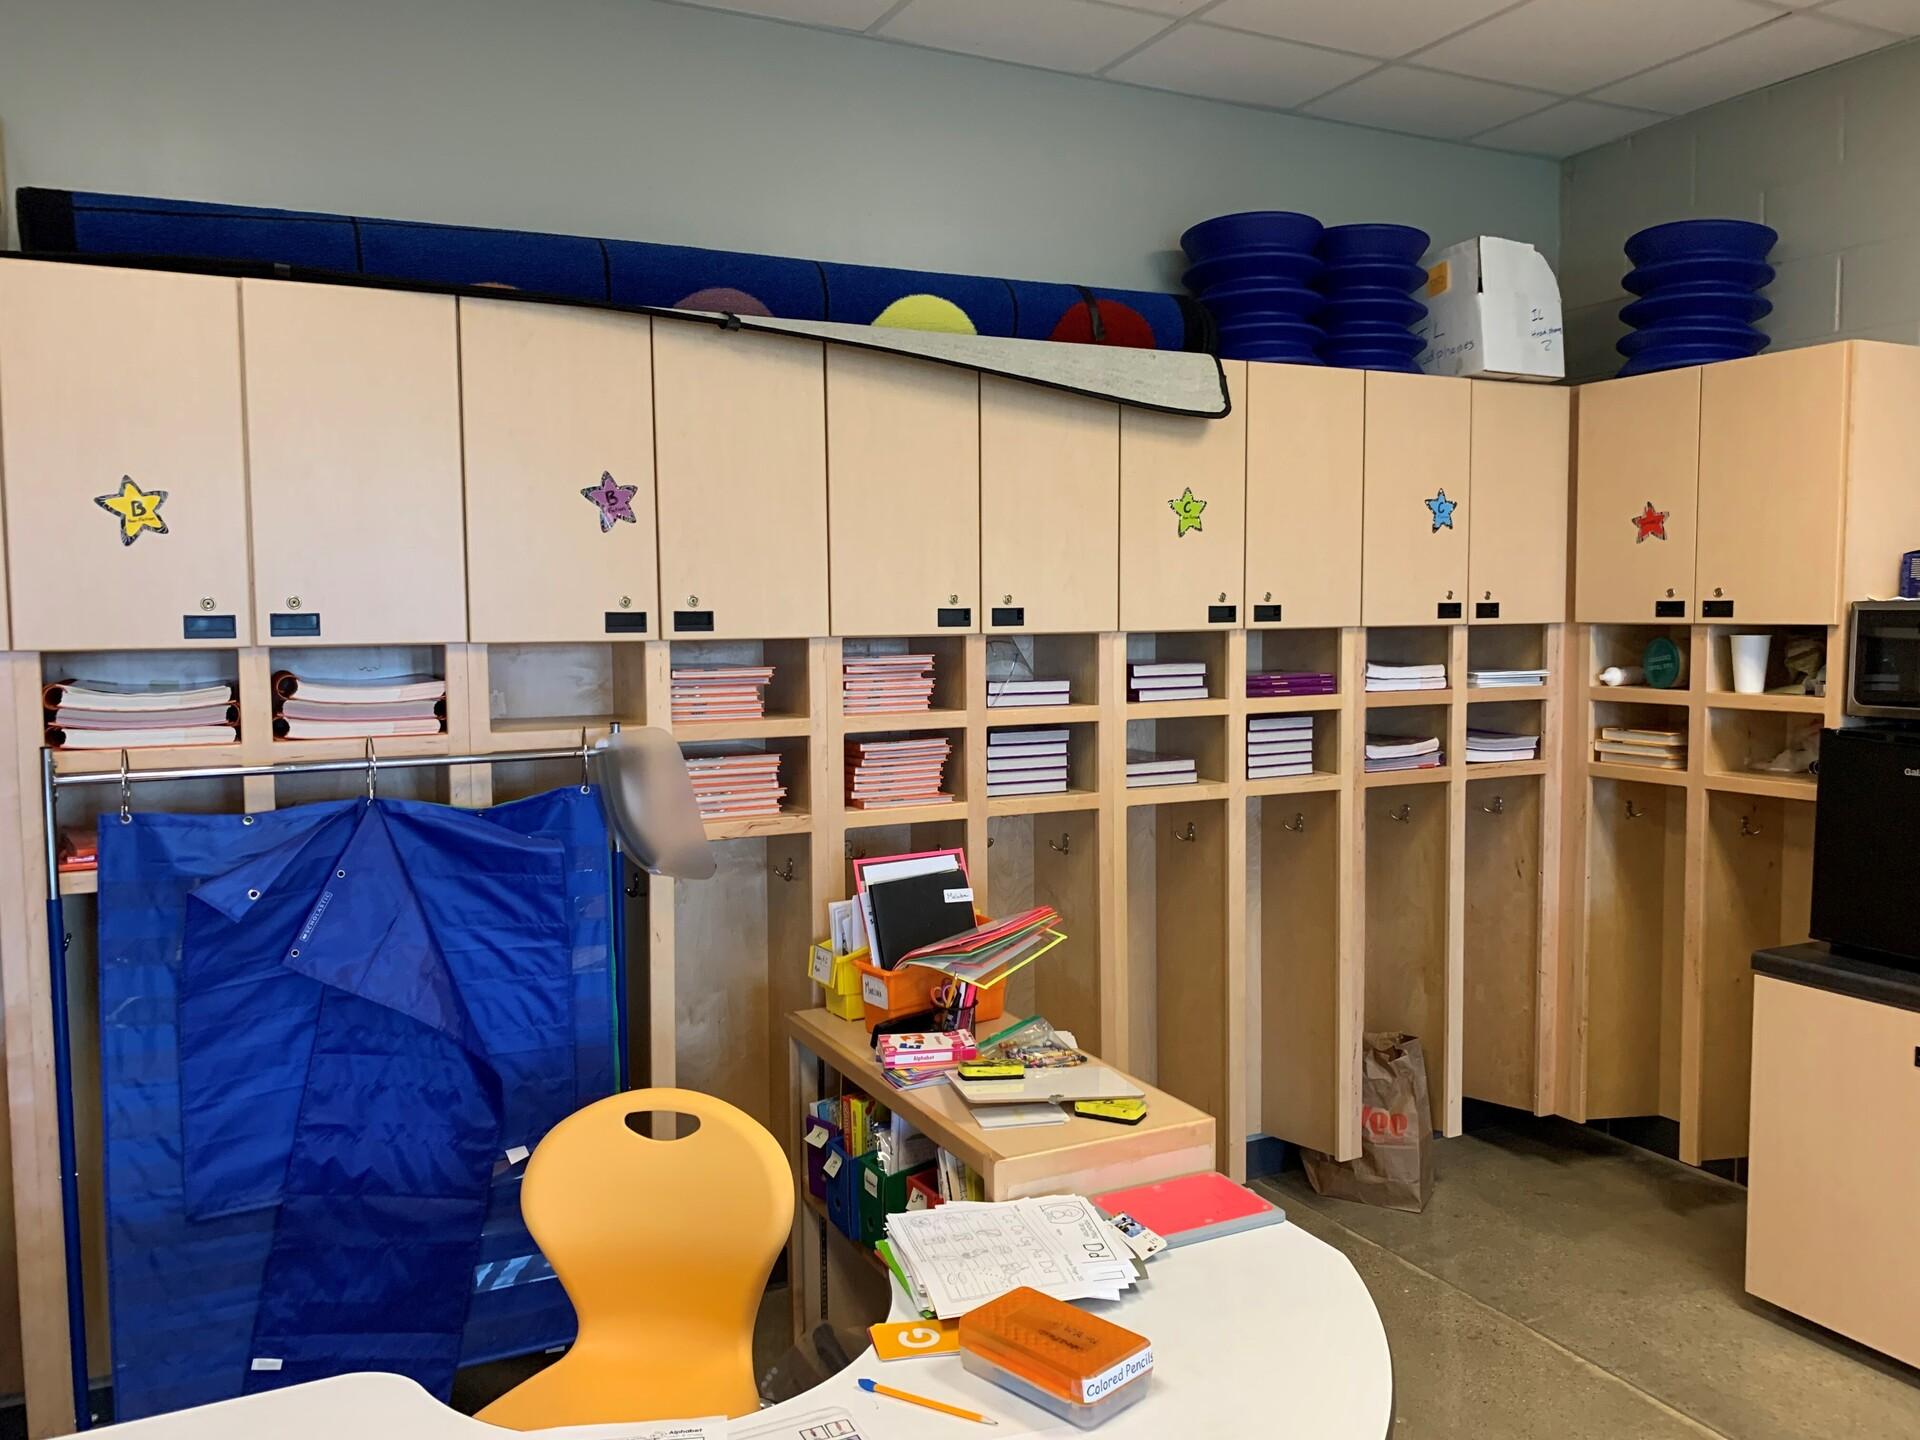 custom-classroom-cabinets-dras-cases-millwork-design-1920x1920